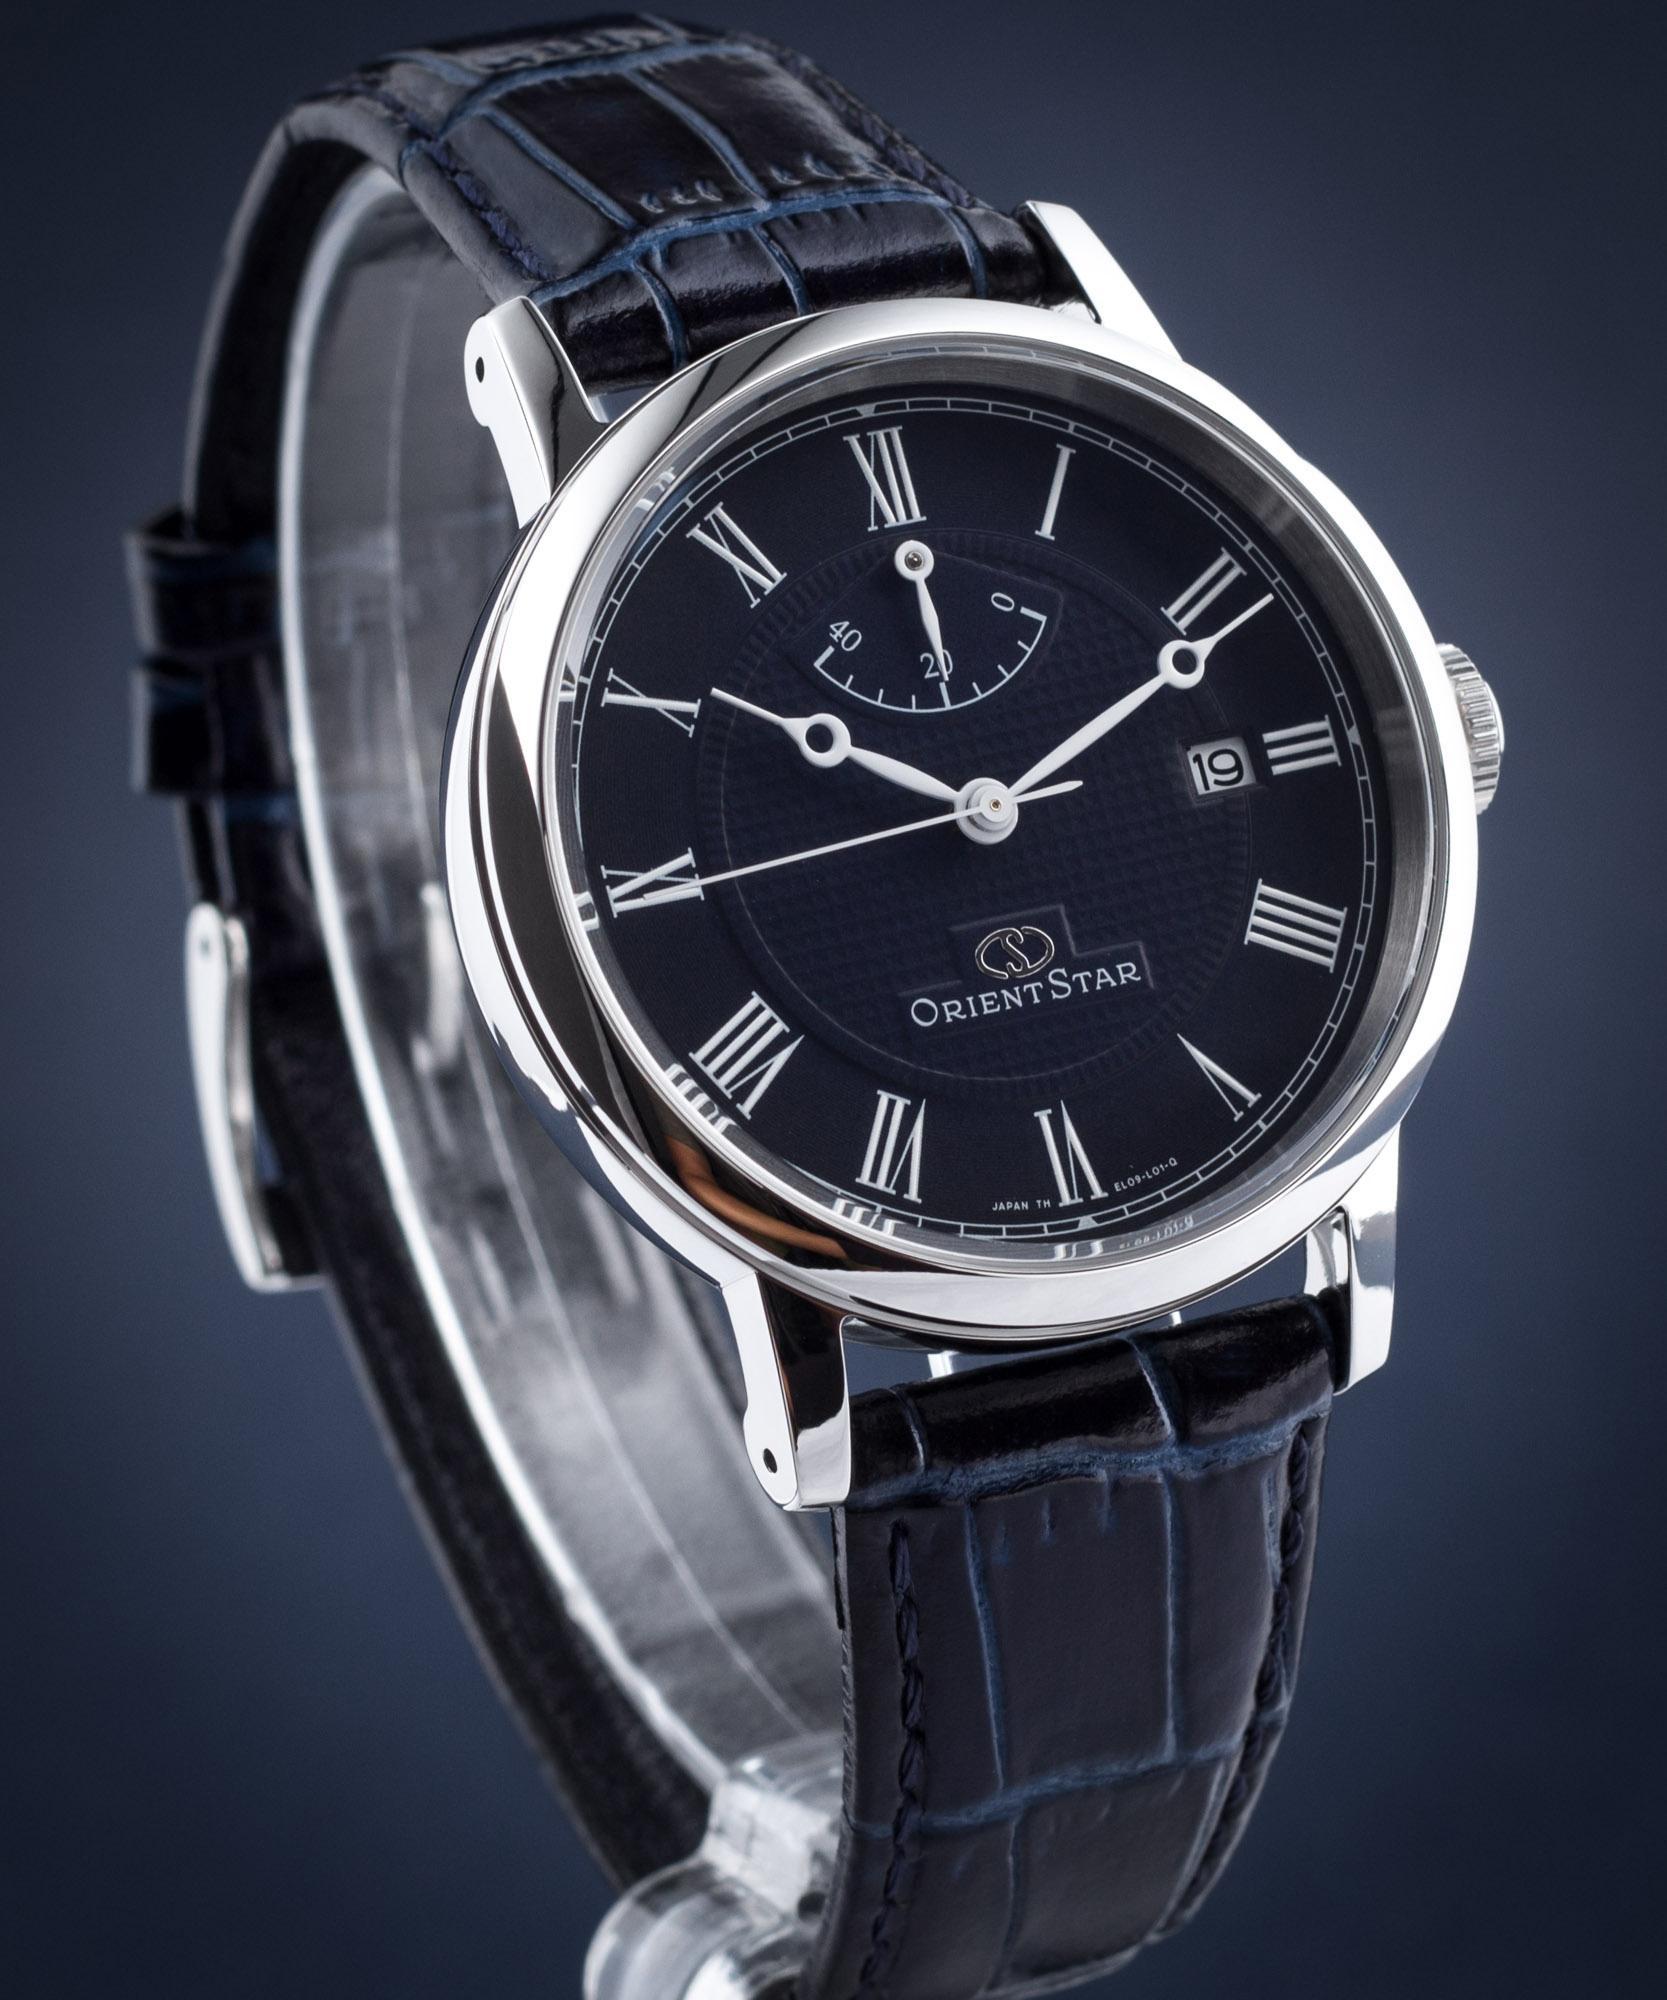 Zegarek męski Orient Star Classic Automatic